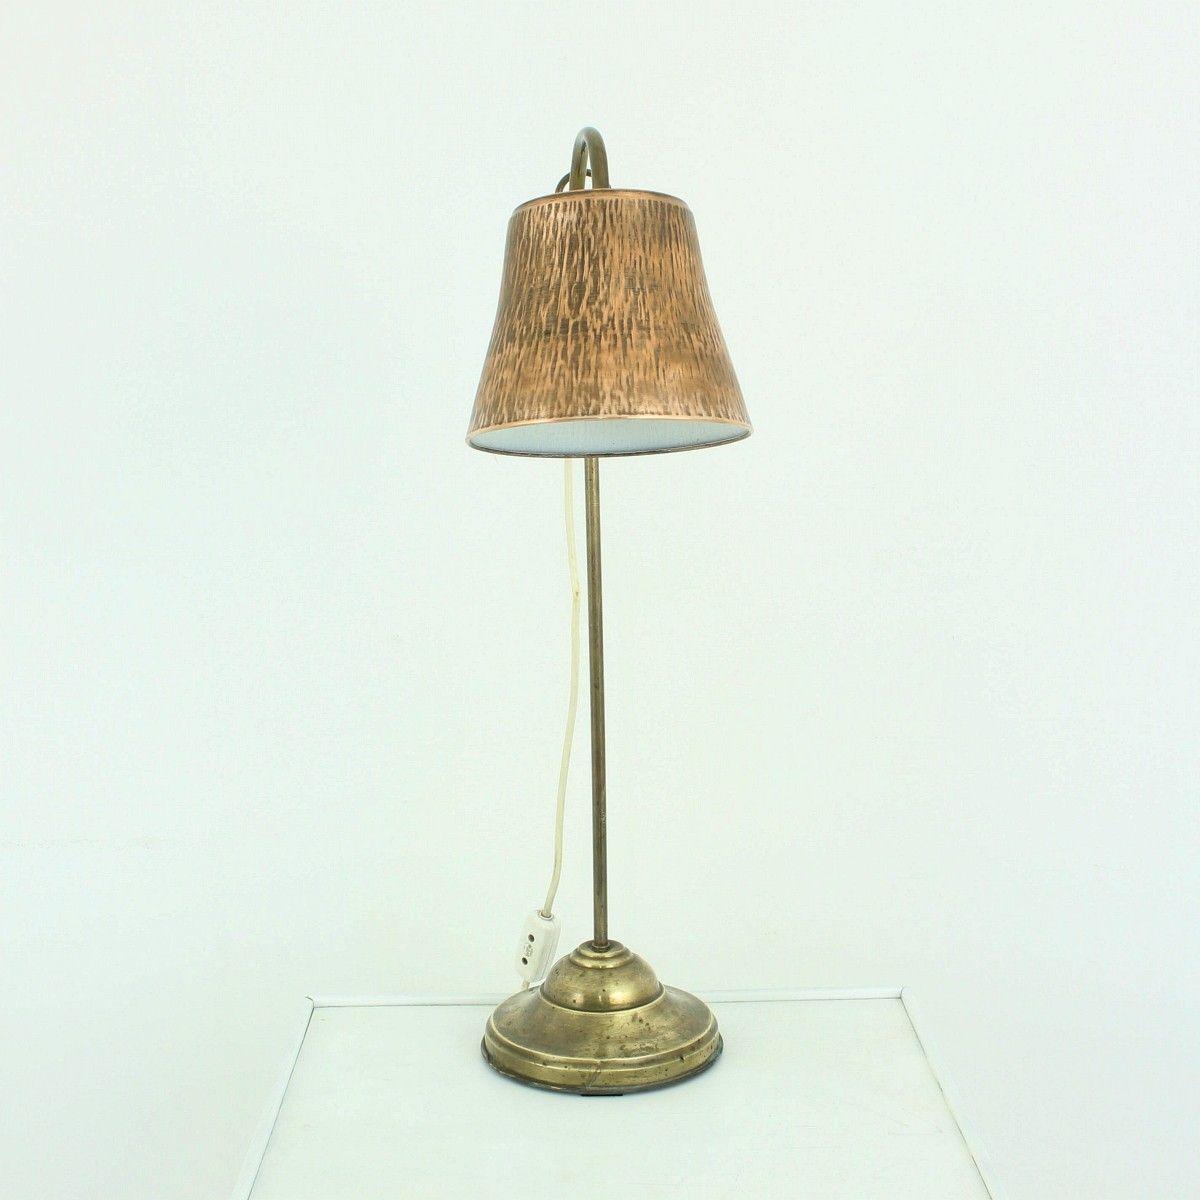 messing kupfer tischlampe 1920er bei pamono kaufen. Black Bedroom Furniture Sets. Home Design Ideas